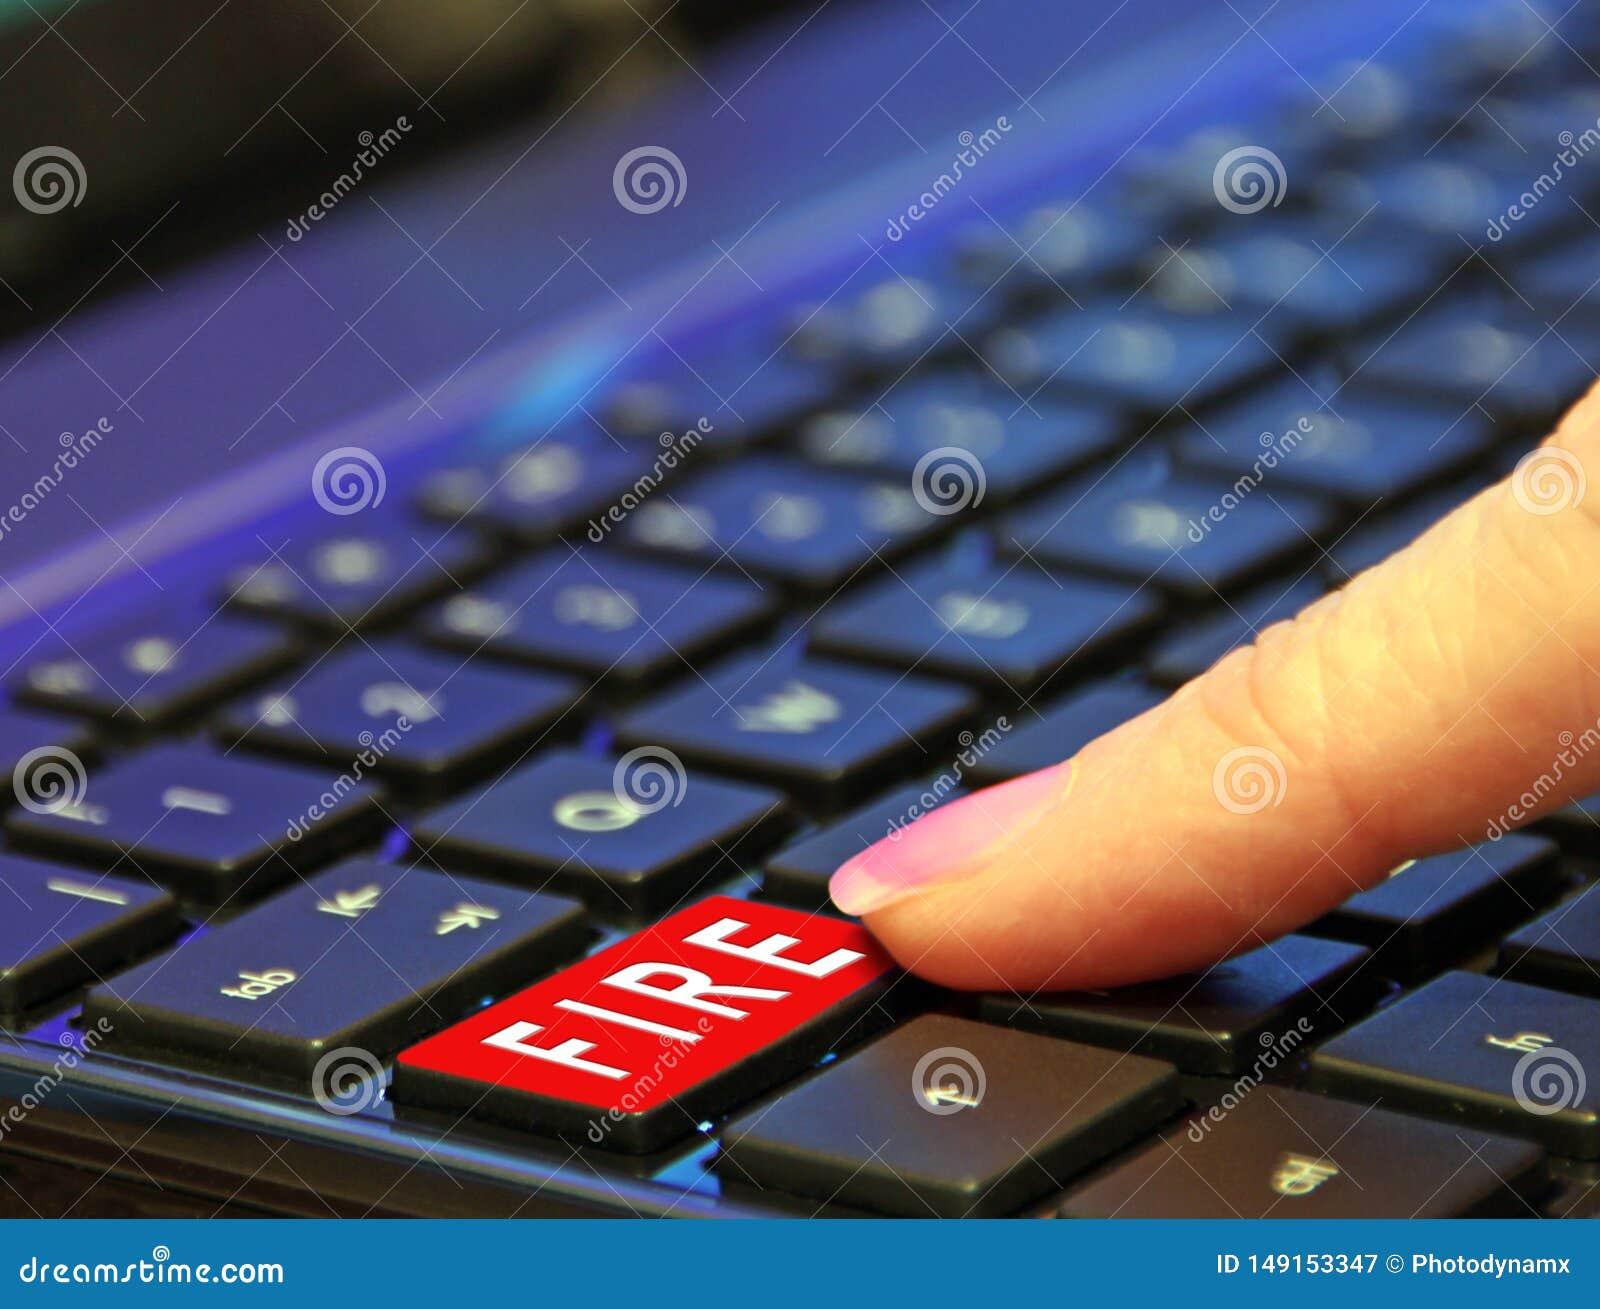 Trojan f?r ransomware f?r malware f?r virus f?r reng?ringsduk f?r ondsint attack f?r r?d knapp f?r datorbrand m?rk